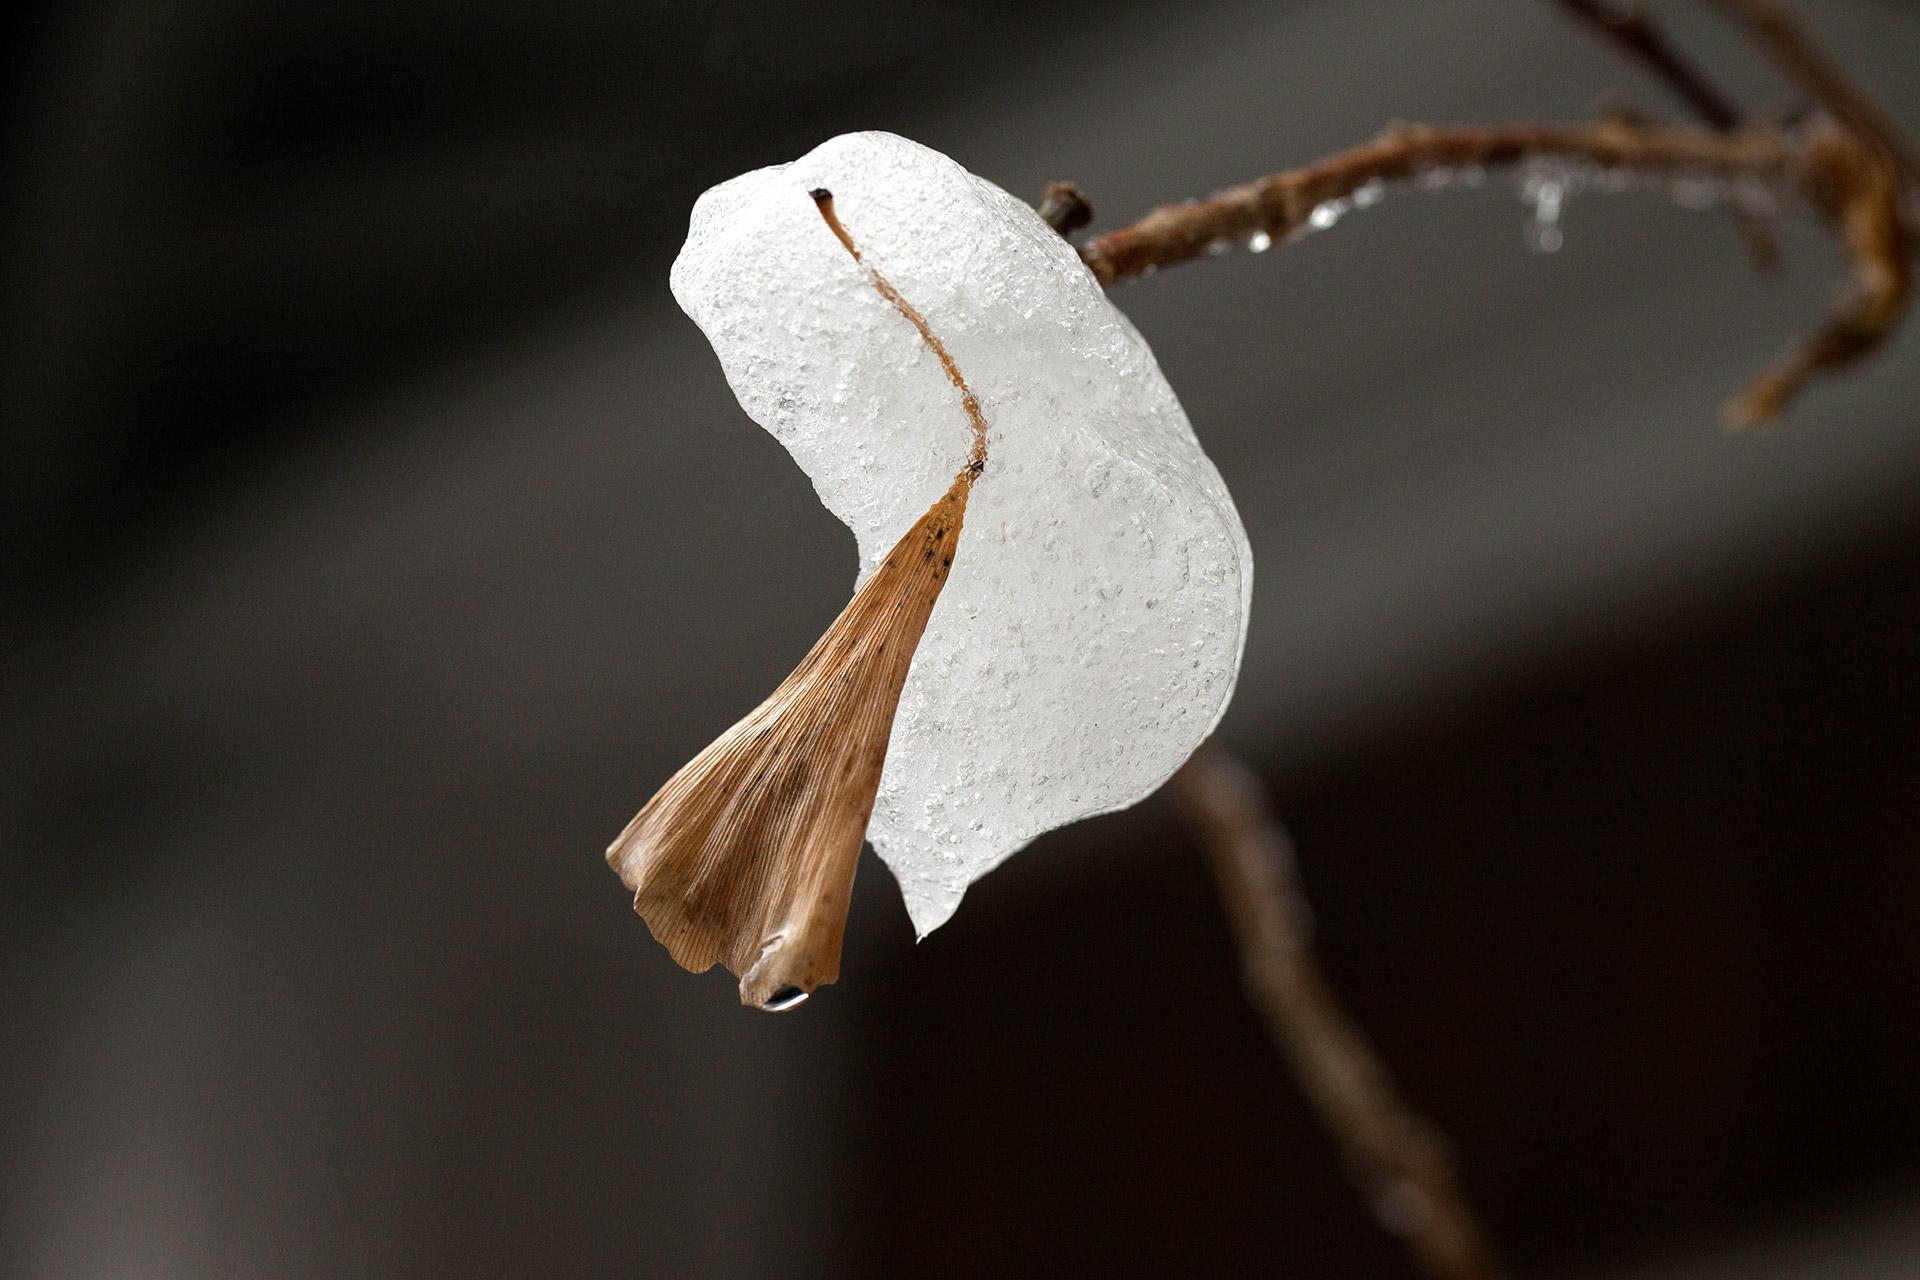 1554_leaf_in_ice_1920.jpg